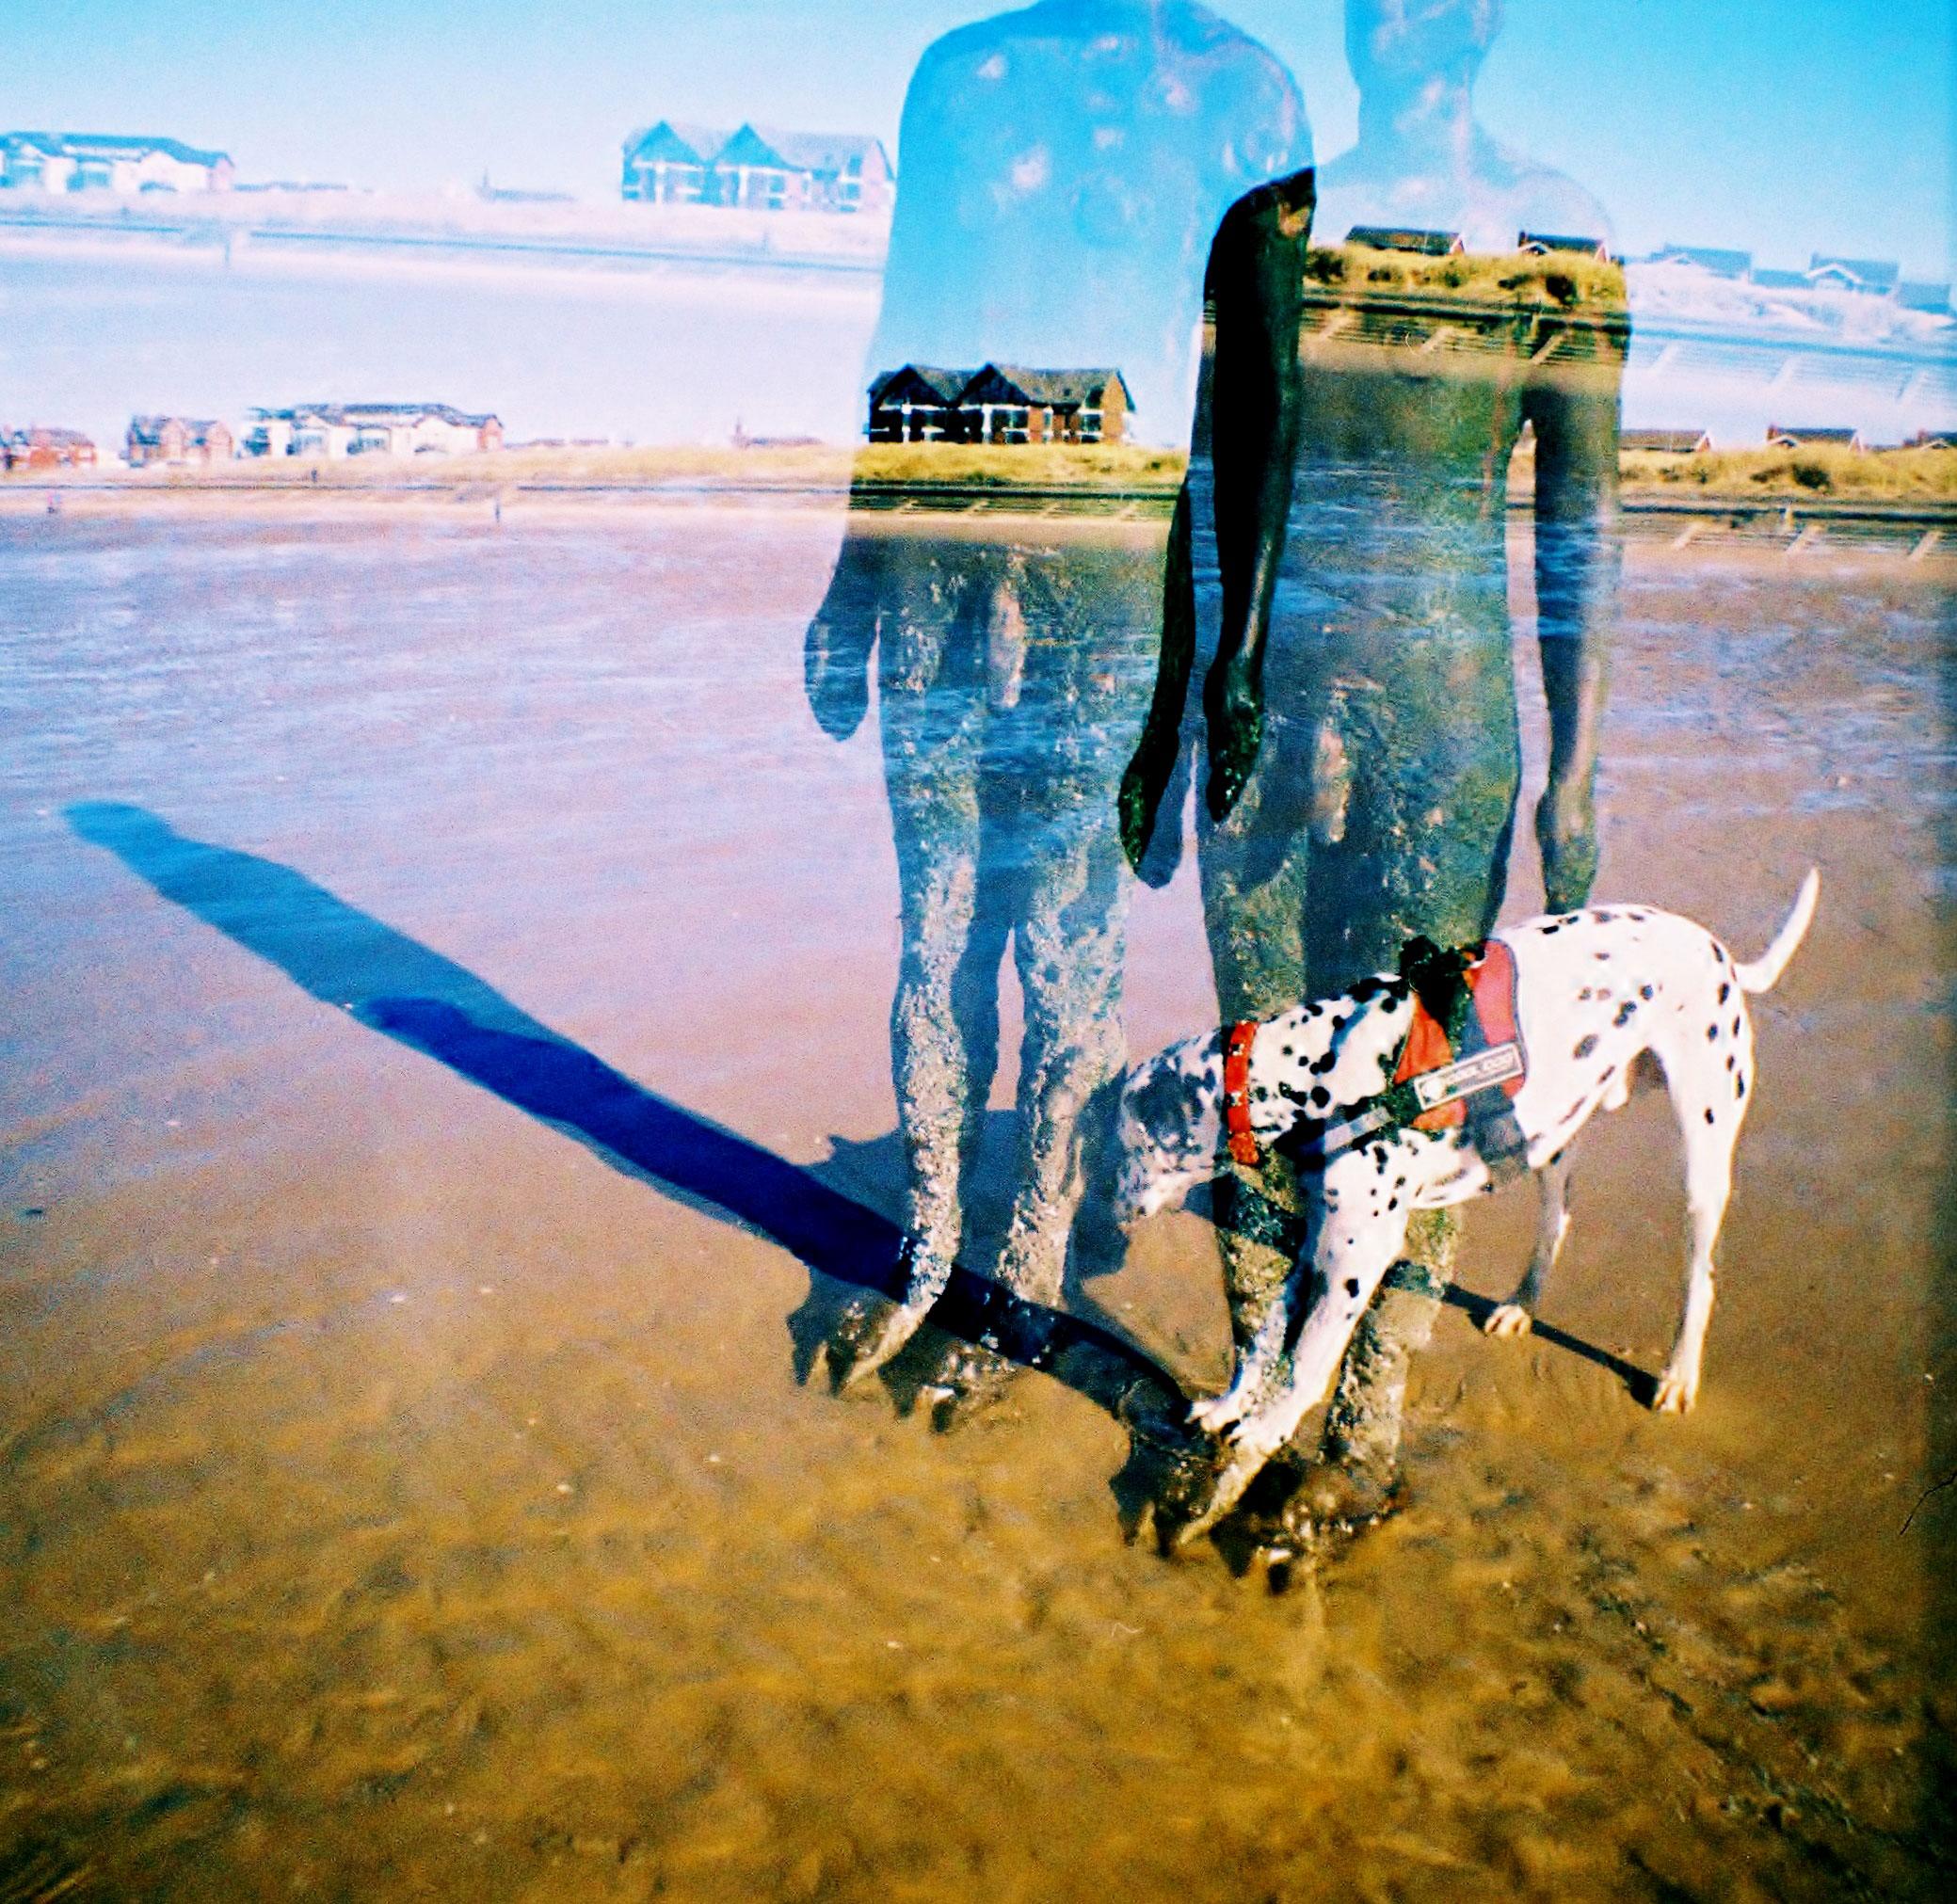 Lucy Wainwright | Untitled | Diana F+ | Ektachrome crossed